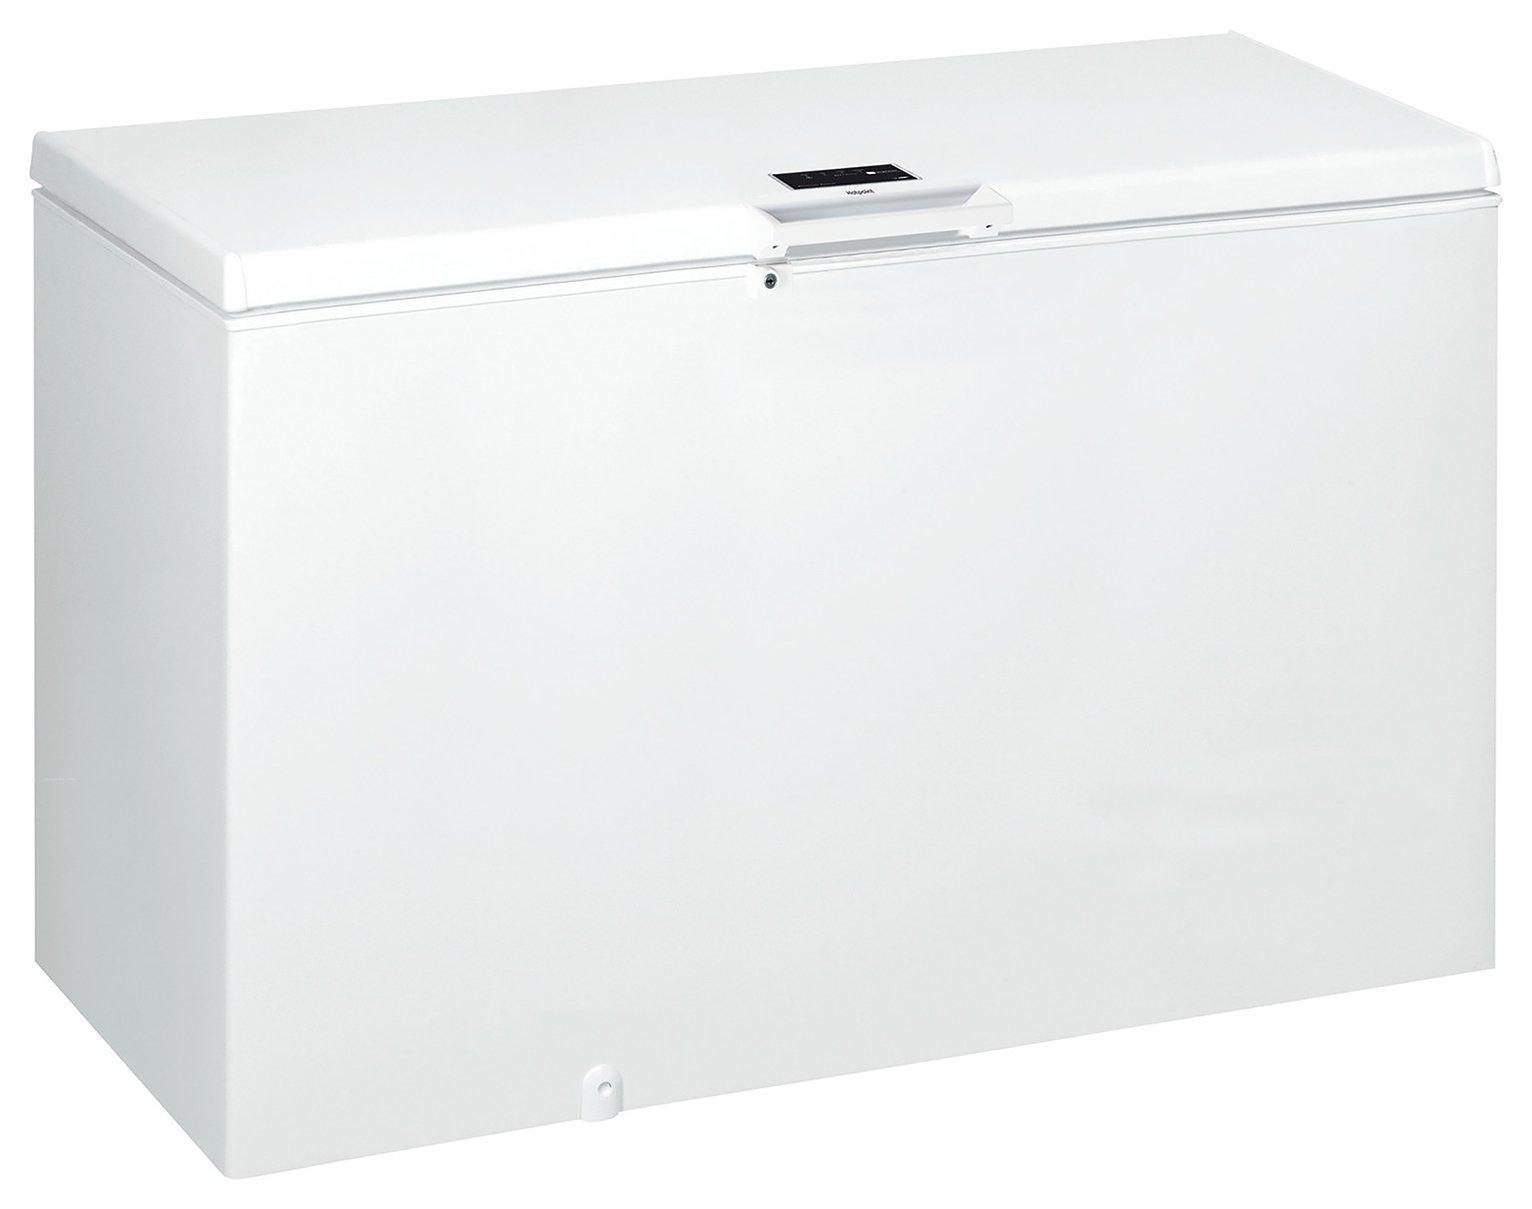 Hotpoint CS1A400FMH Chest Freezer - White